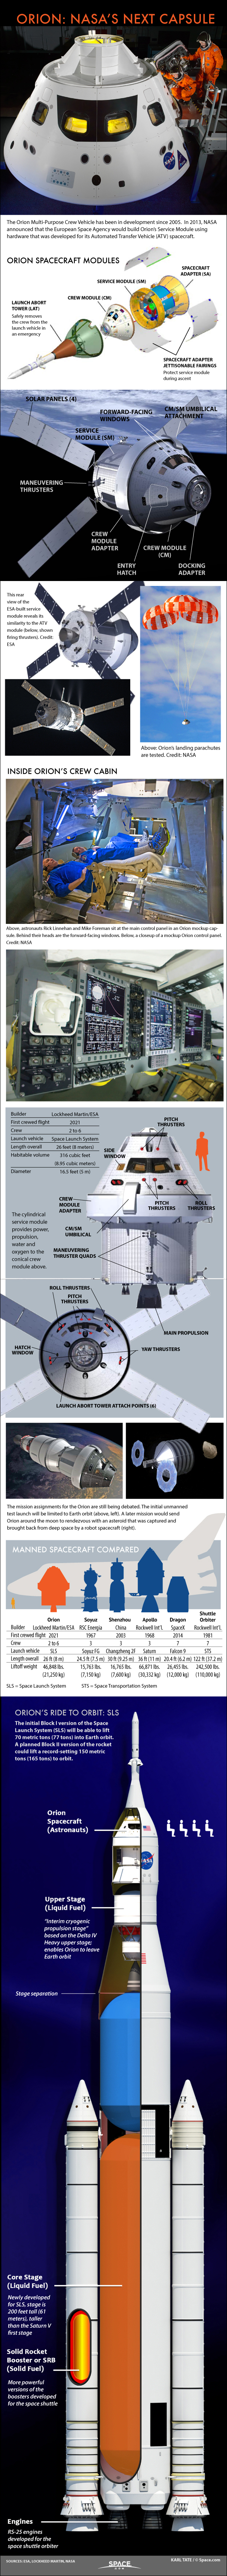 Inside NASA's Multi-Purpose Crew Vehicle (Infographic)